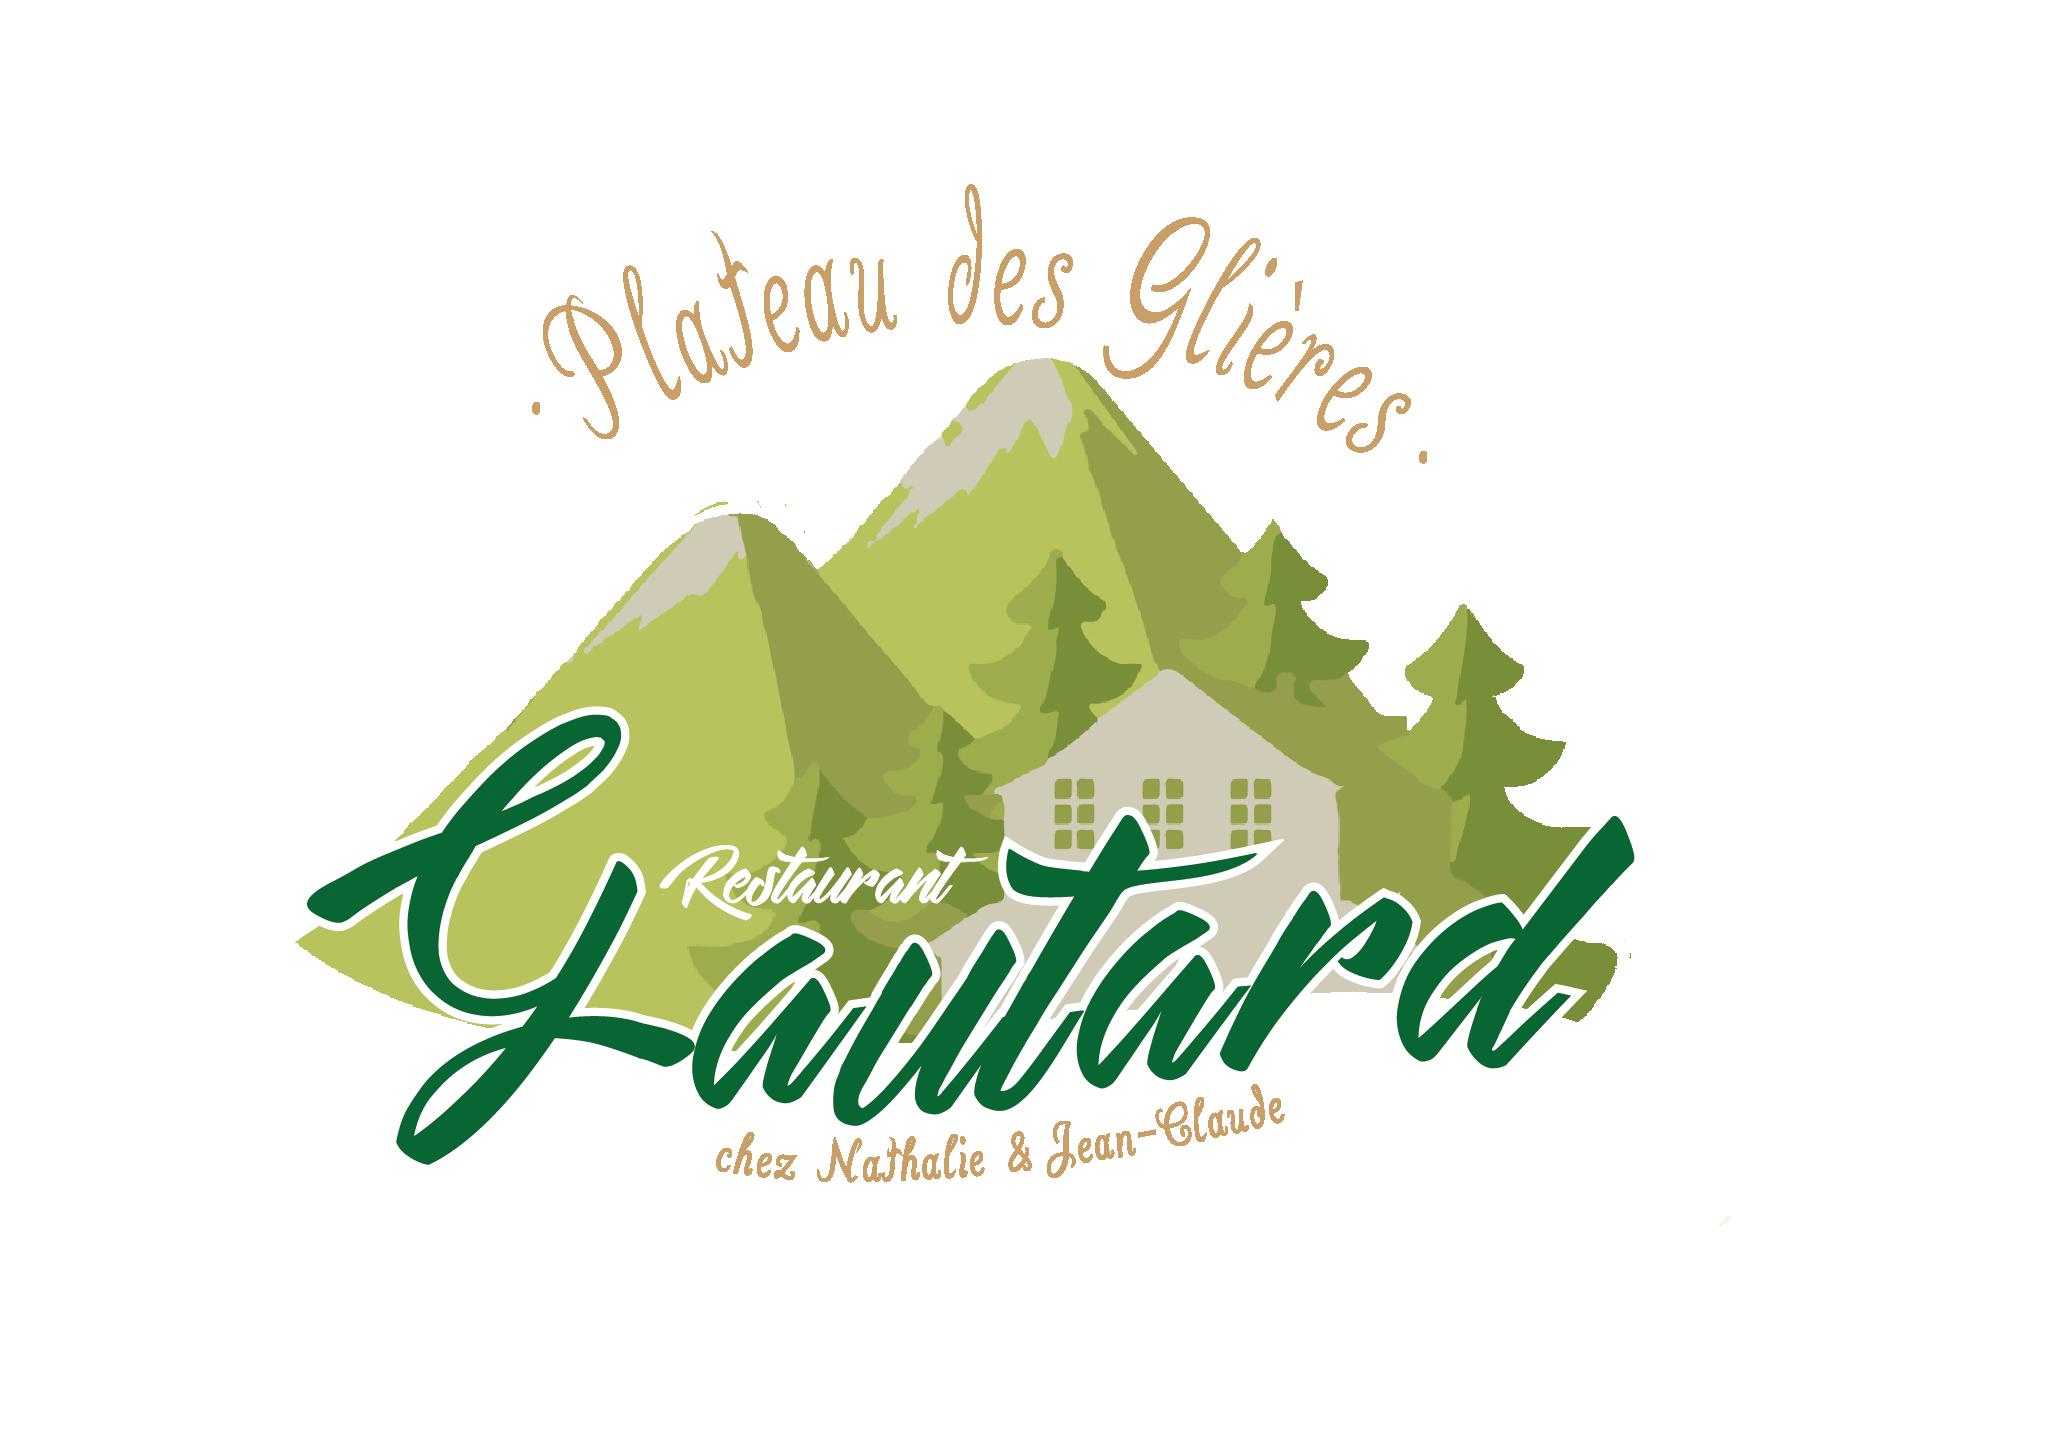 Restaurant Gautard | Chez Nathalie et Jean-Claude